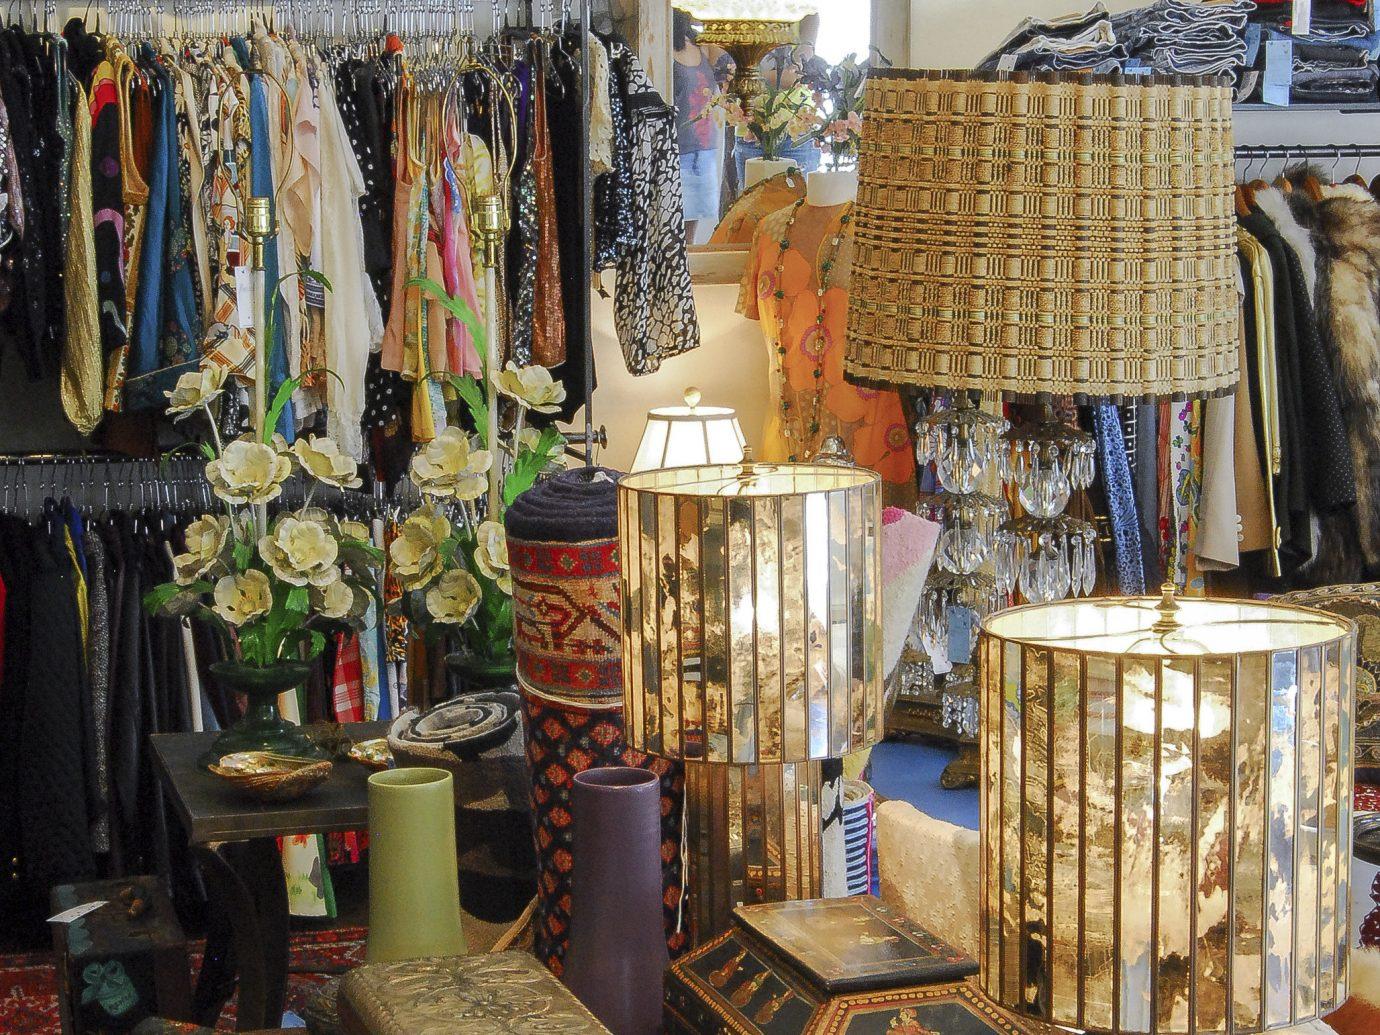 Trip Ideas indoor room public space City furniture art market Boutique cluttered several Shop